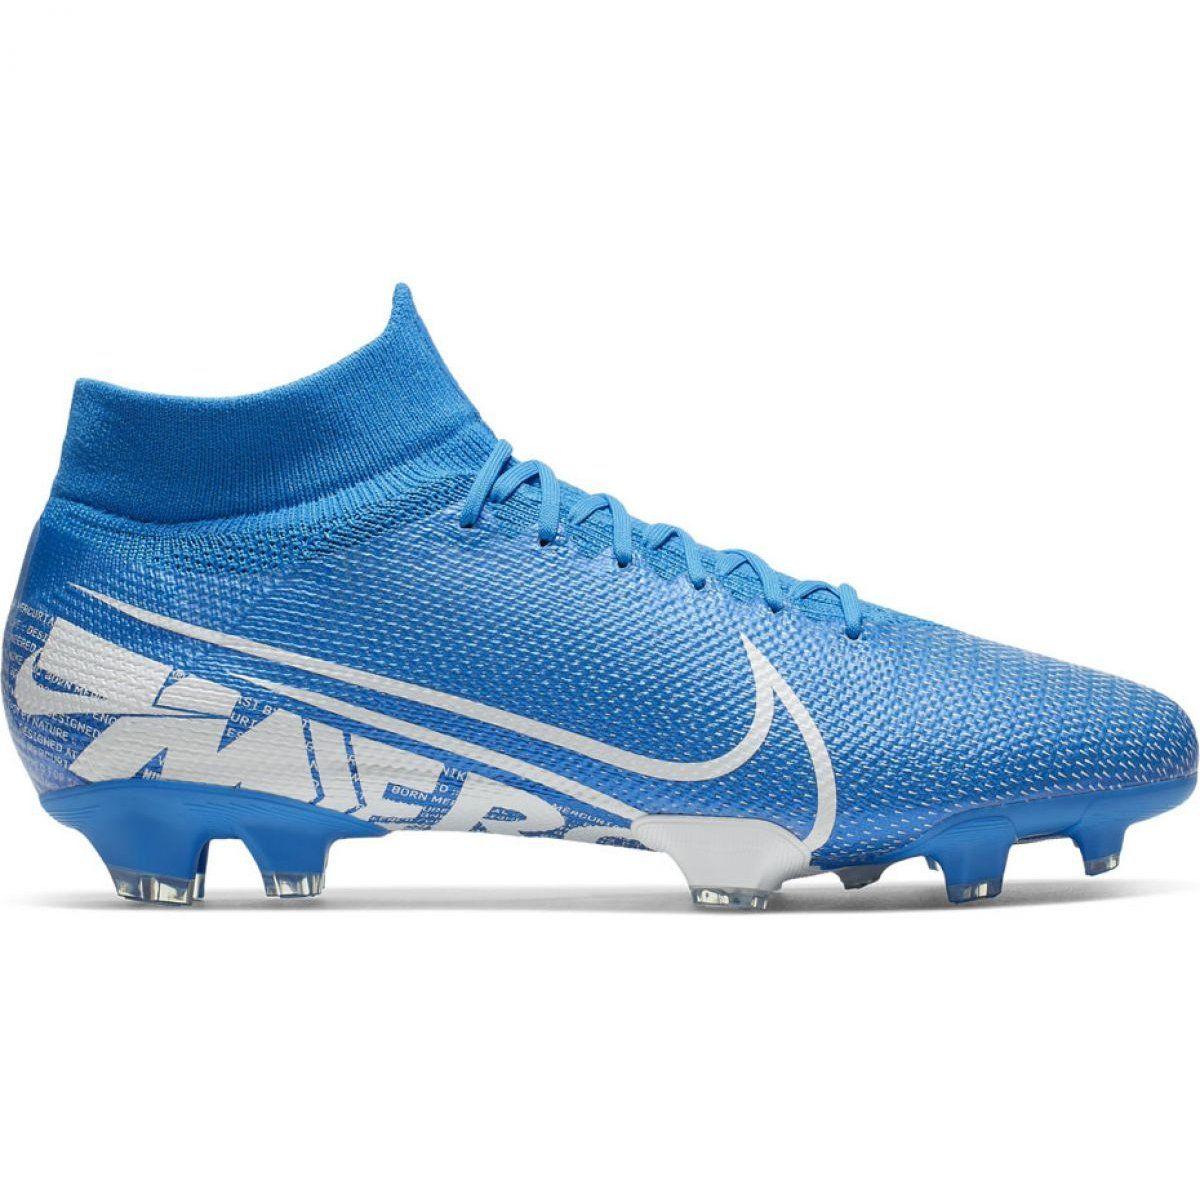 Corks Football Sport Nike Nike Mercurial Superfly 7 Elite Mds Fg Jr Bq5420 401 Football Shoes Blue Blue Superfly Football Shoes Blue Shoes